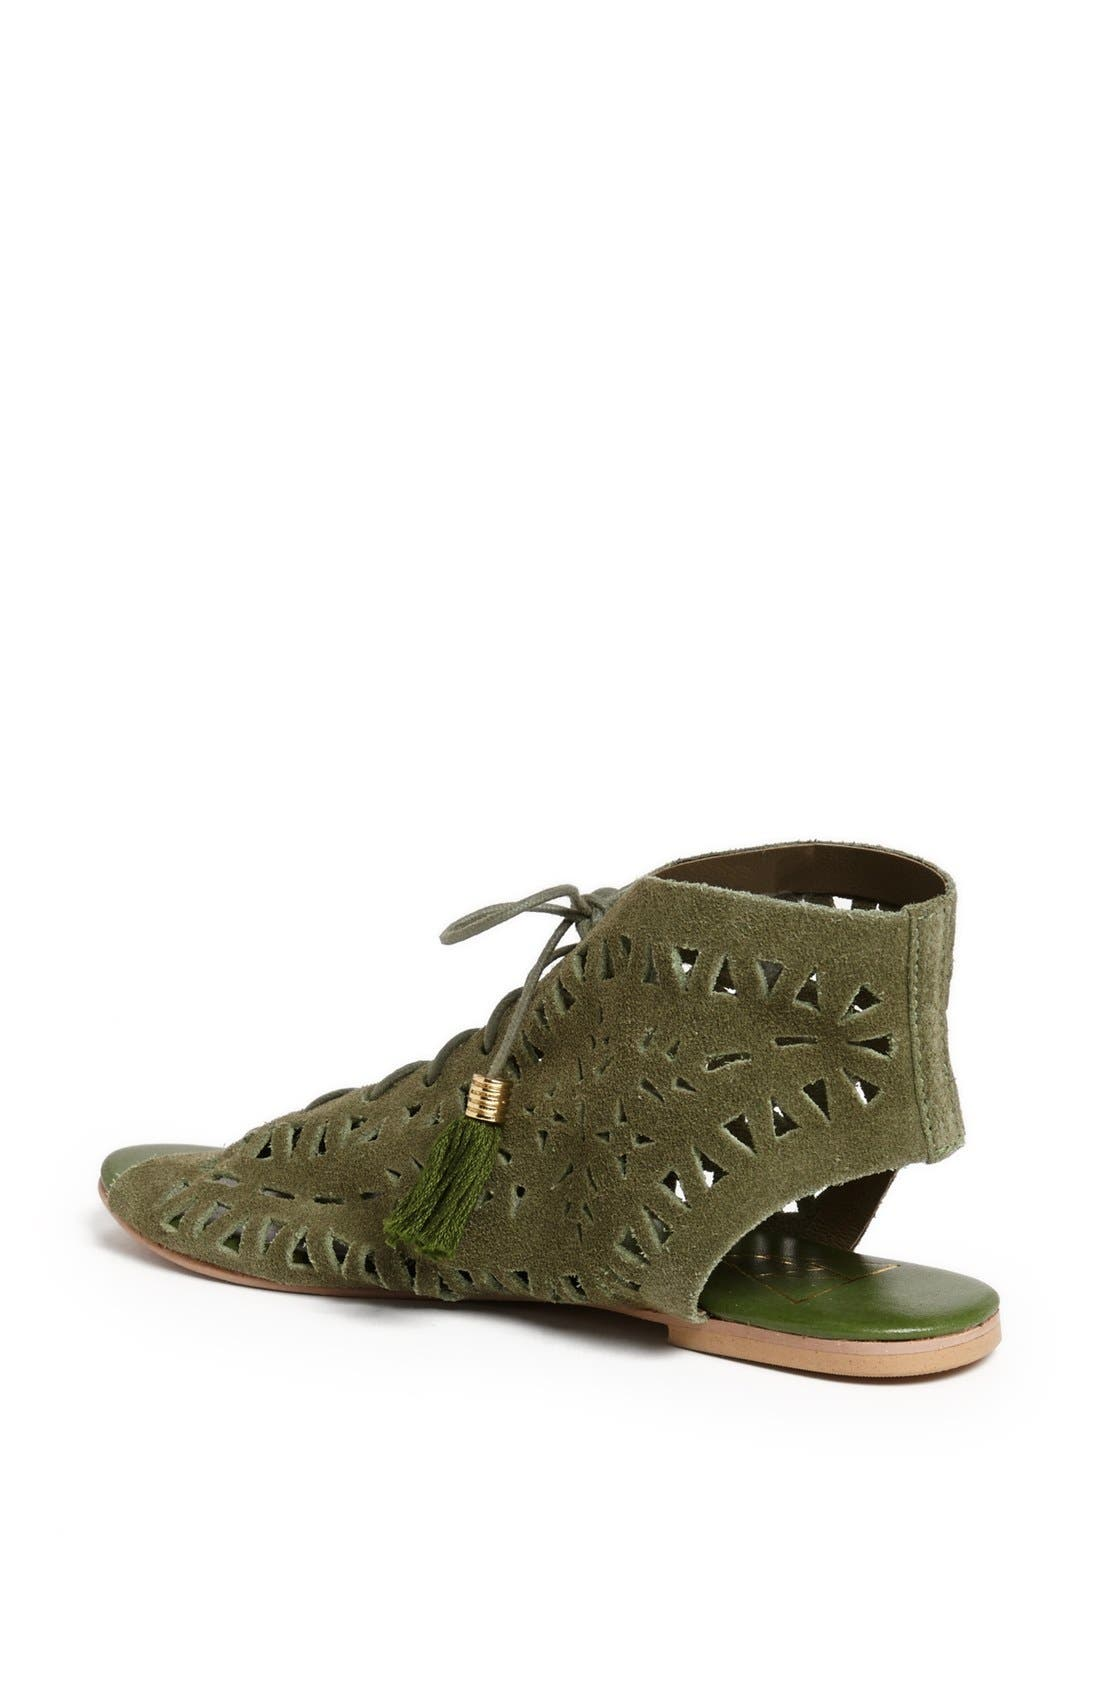 Alternate Image 2  - Matisse 'Ascot Friday - Boheme' Sandal